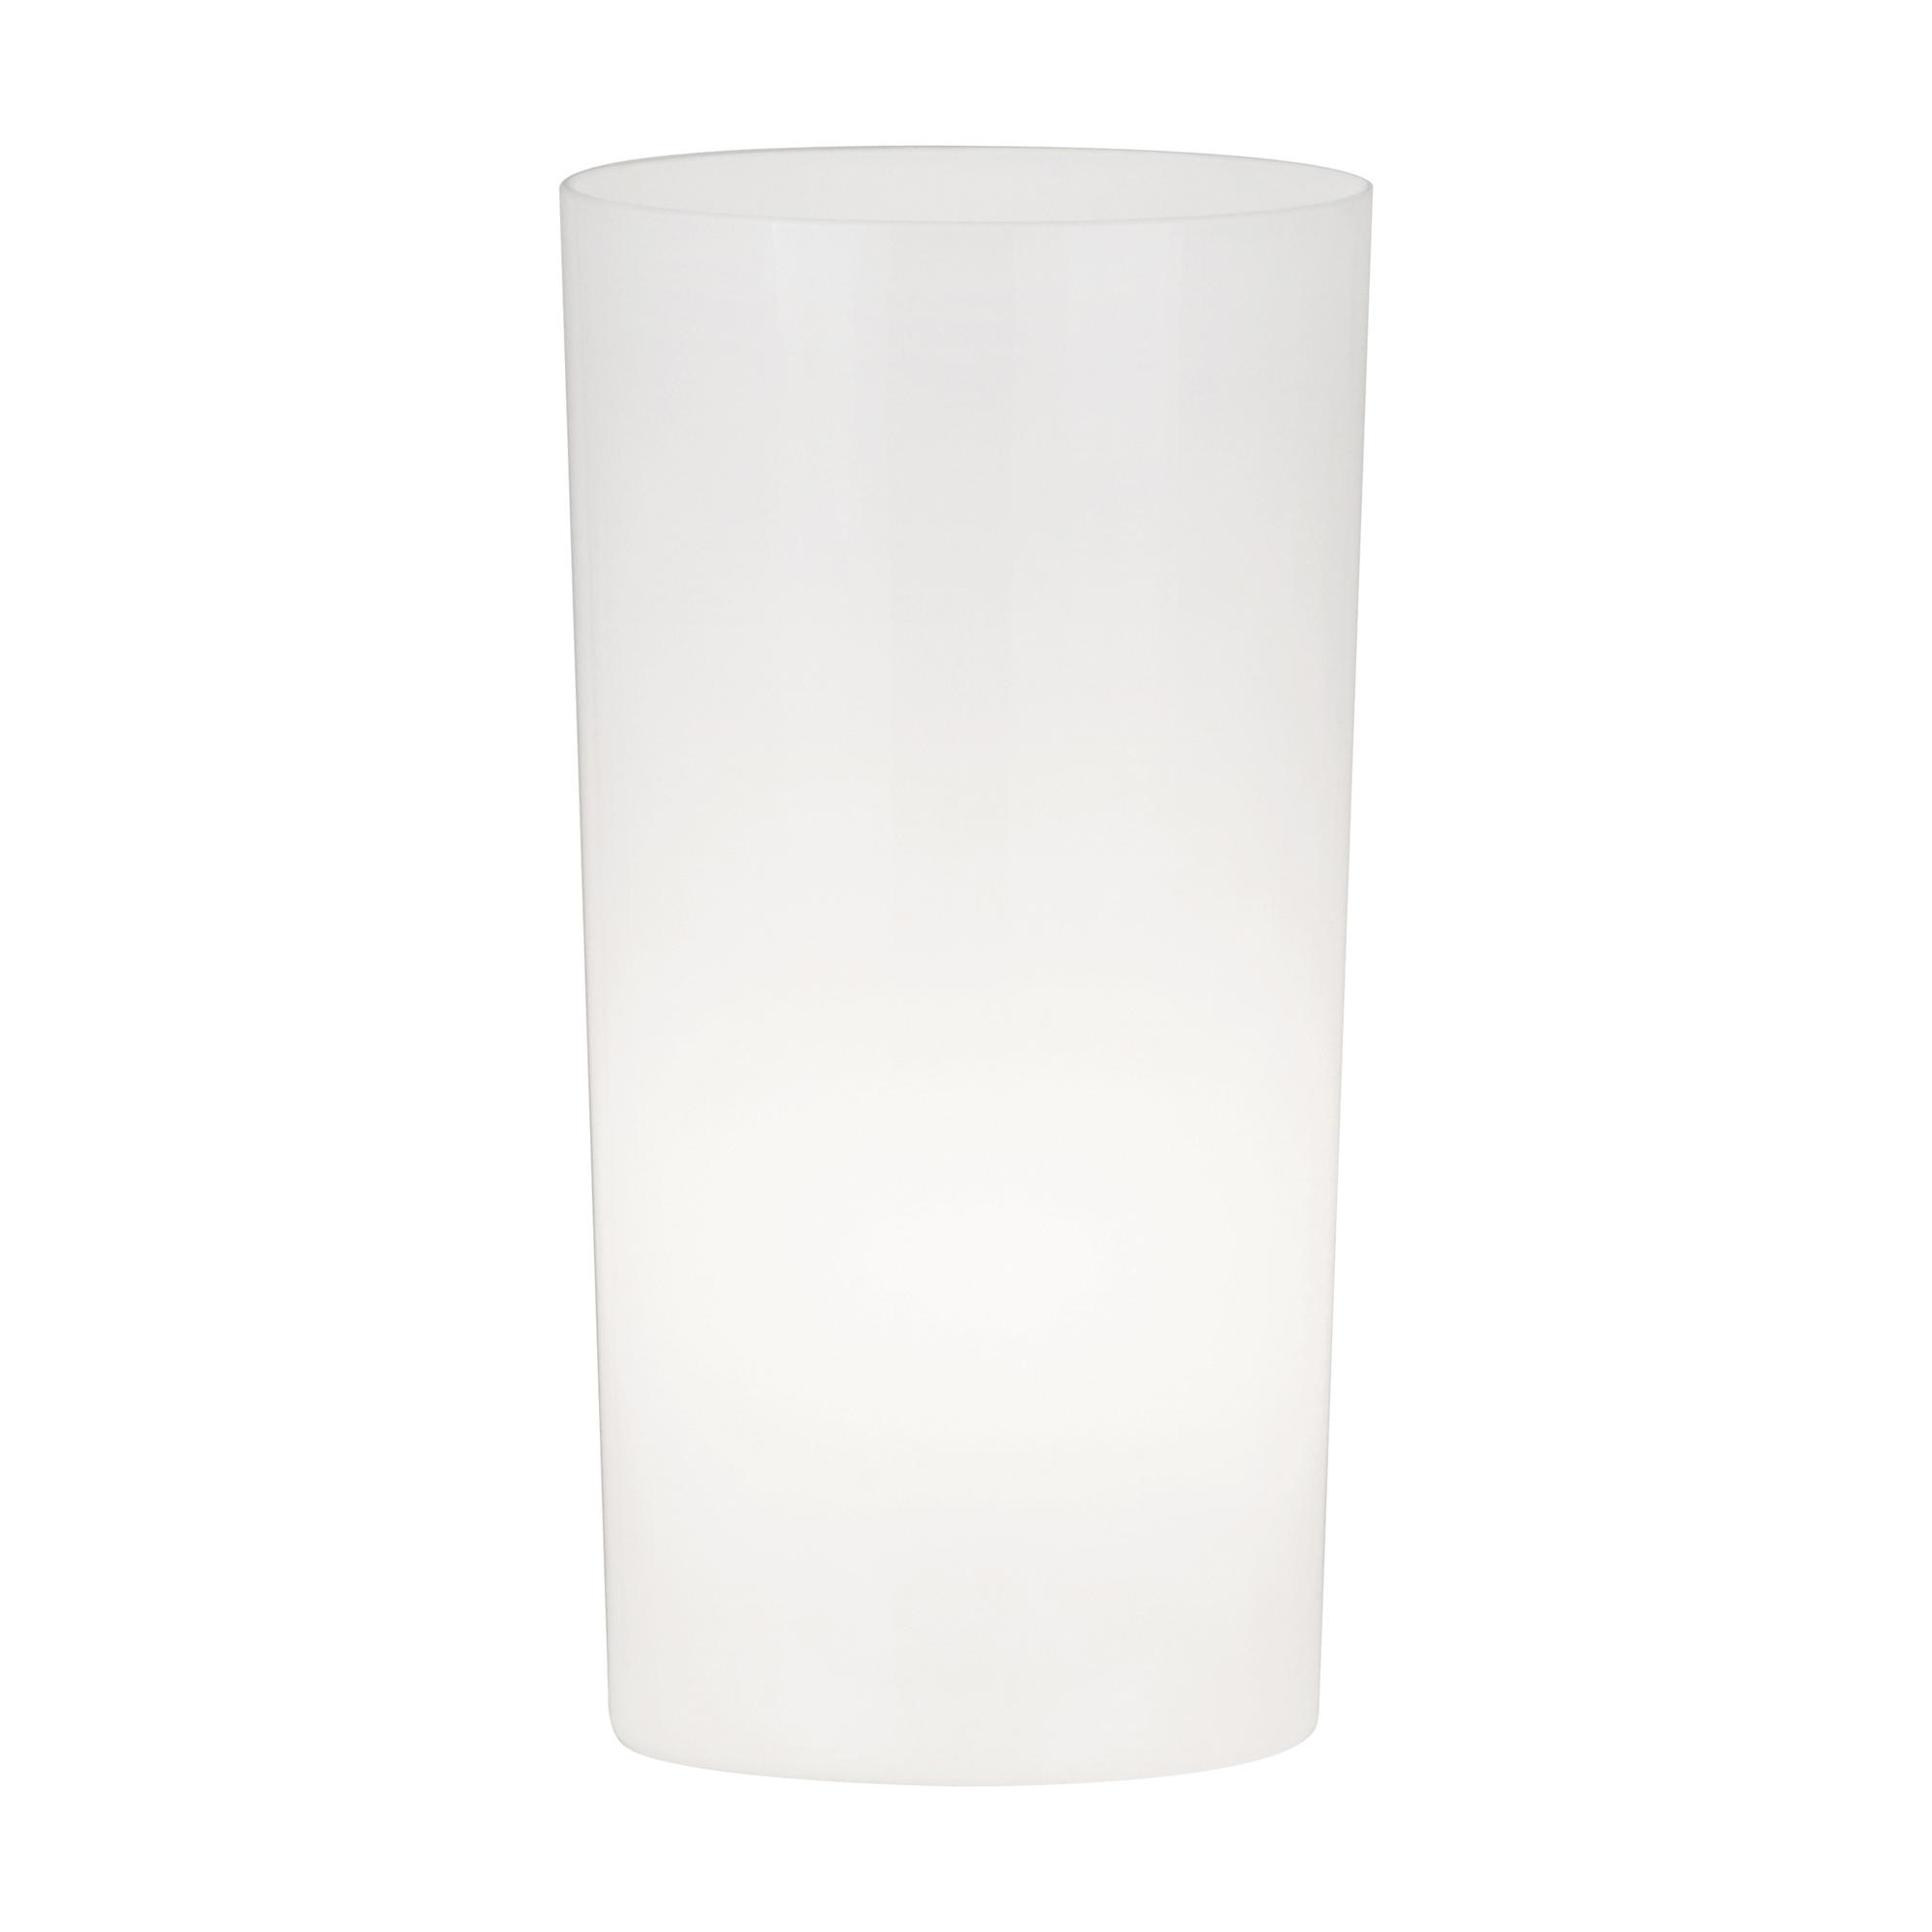 Rico Espinet Lua Vessel Accent Lamp Style #1595